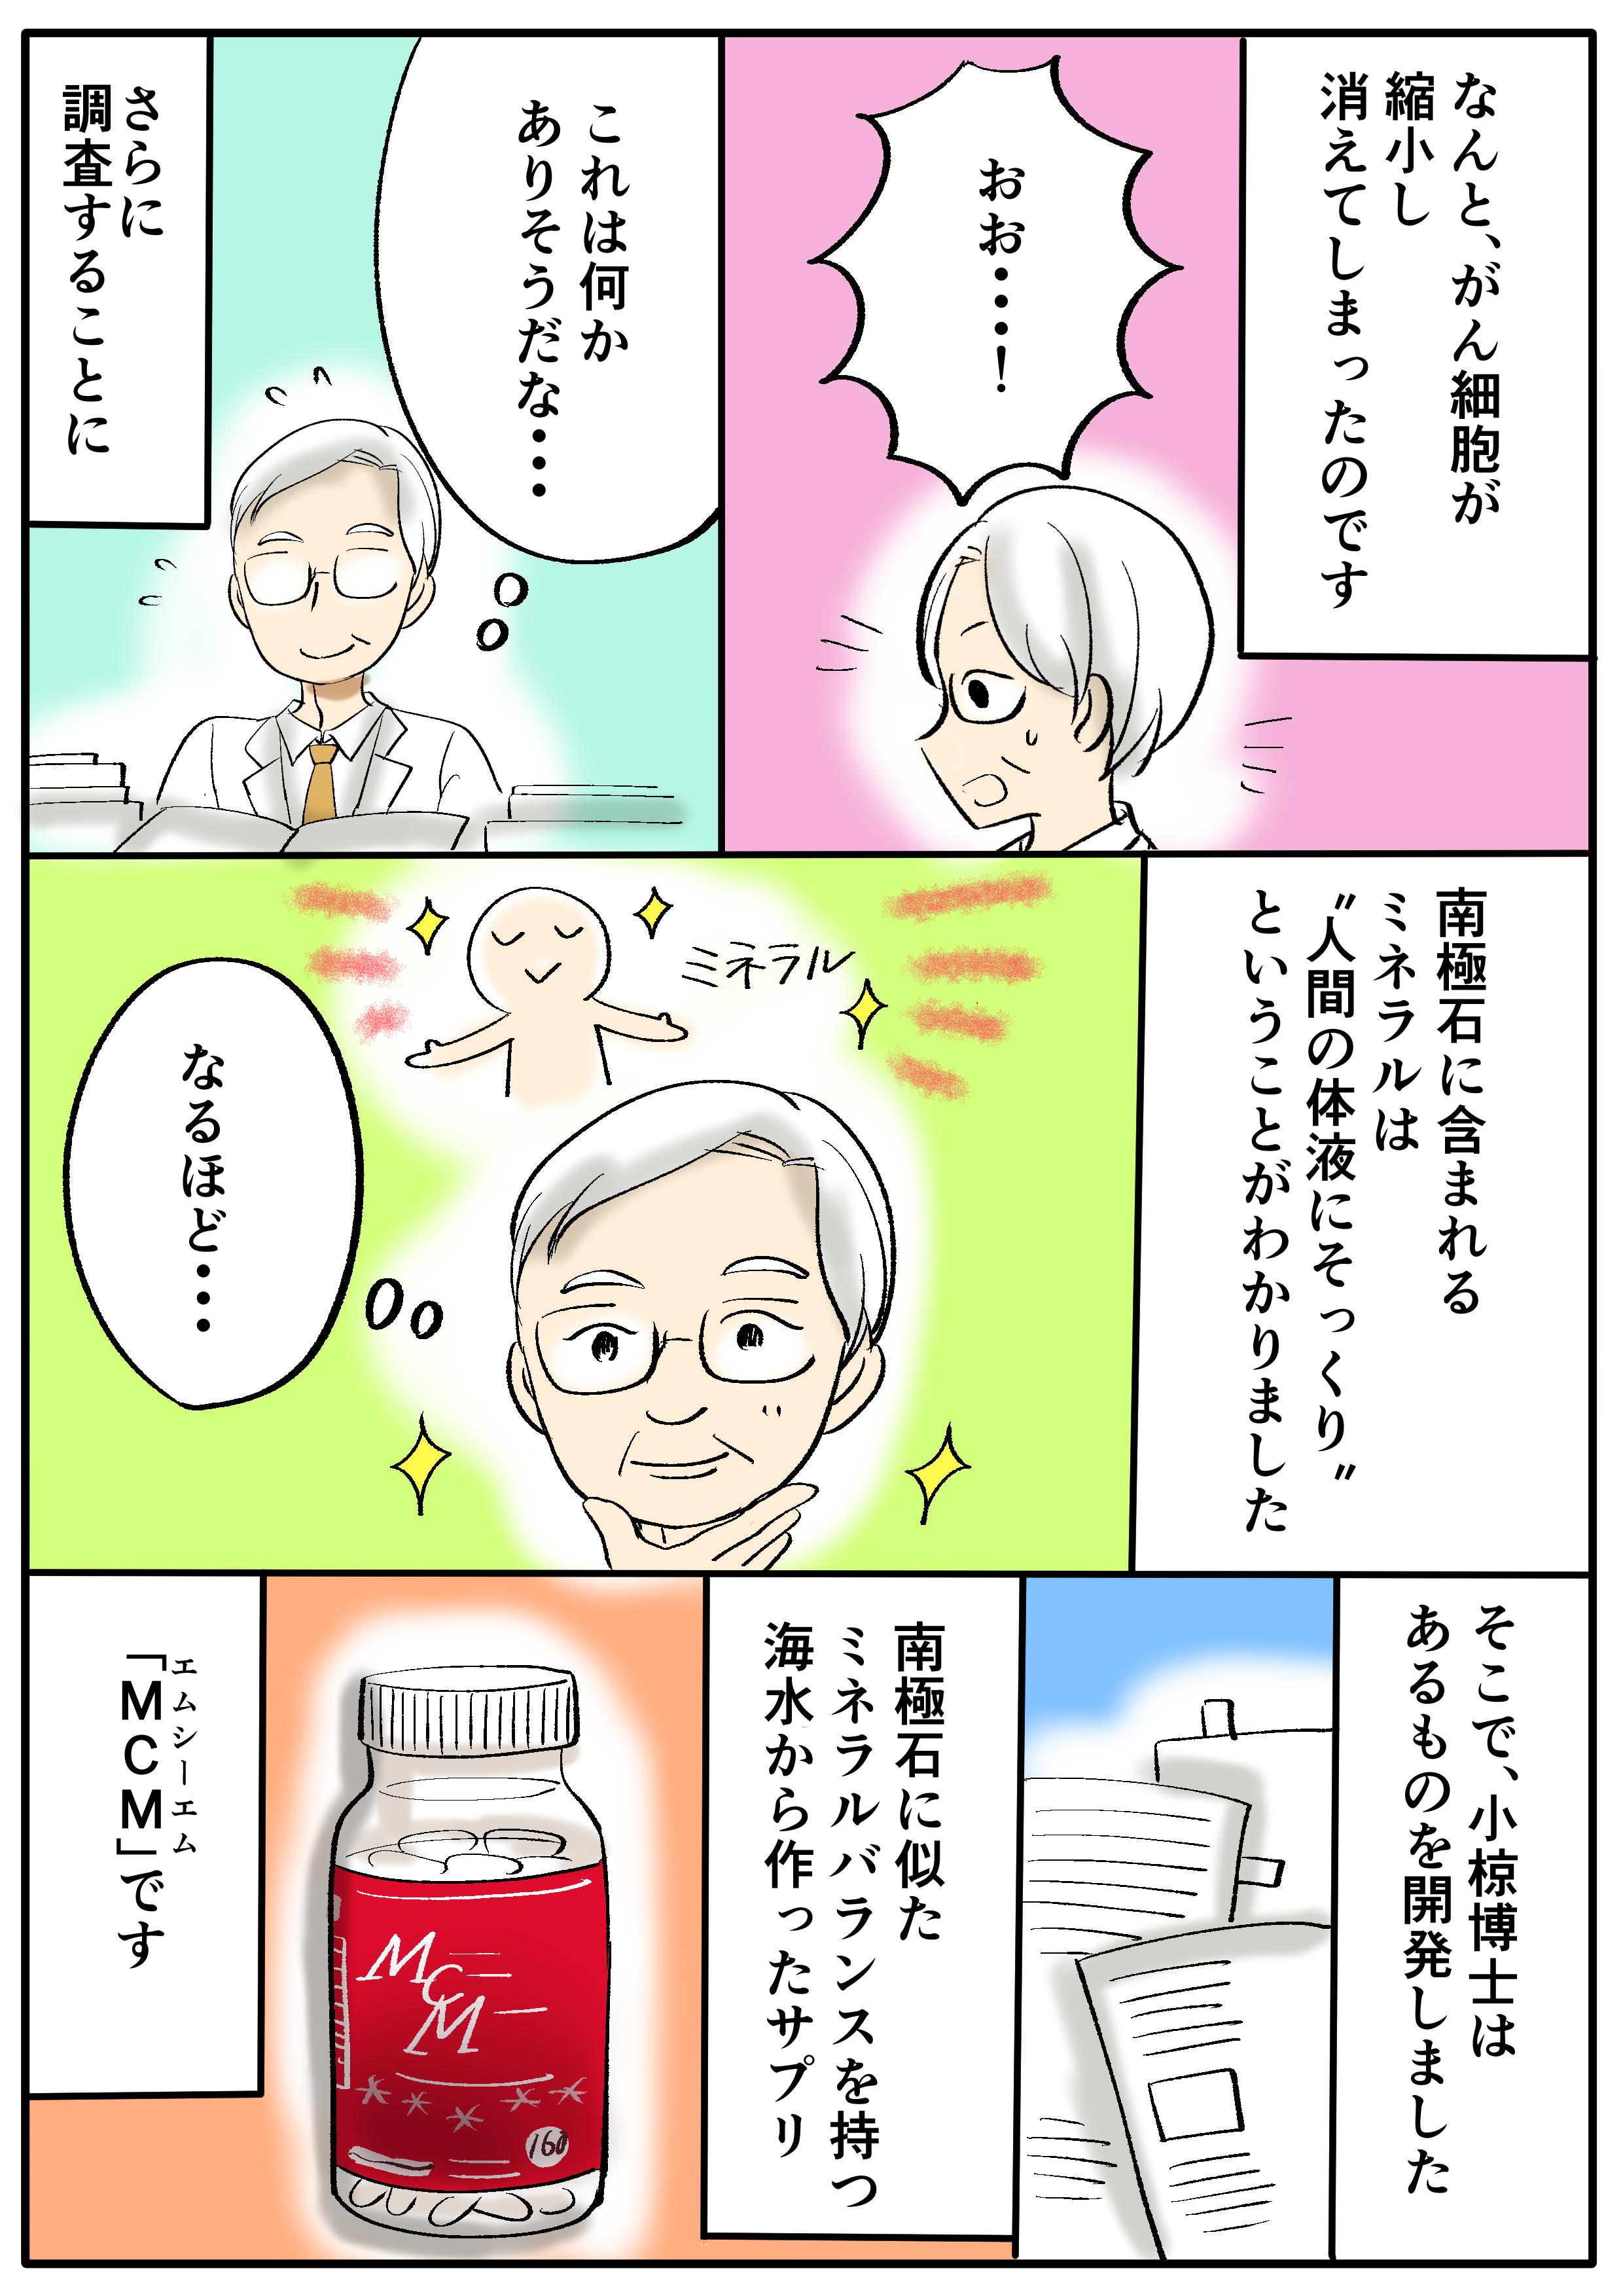 MCM漫画2